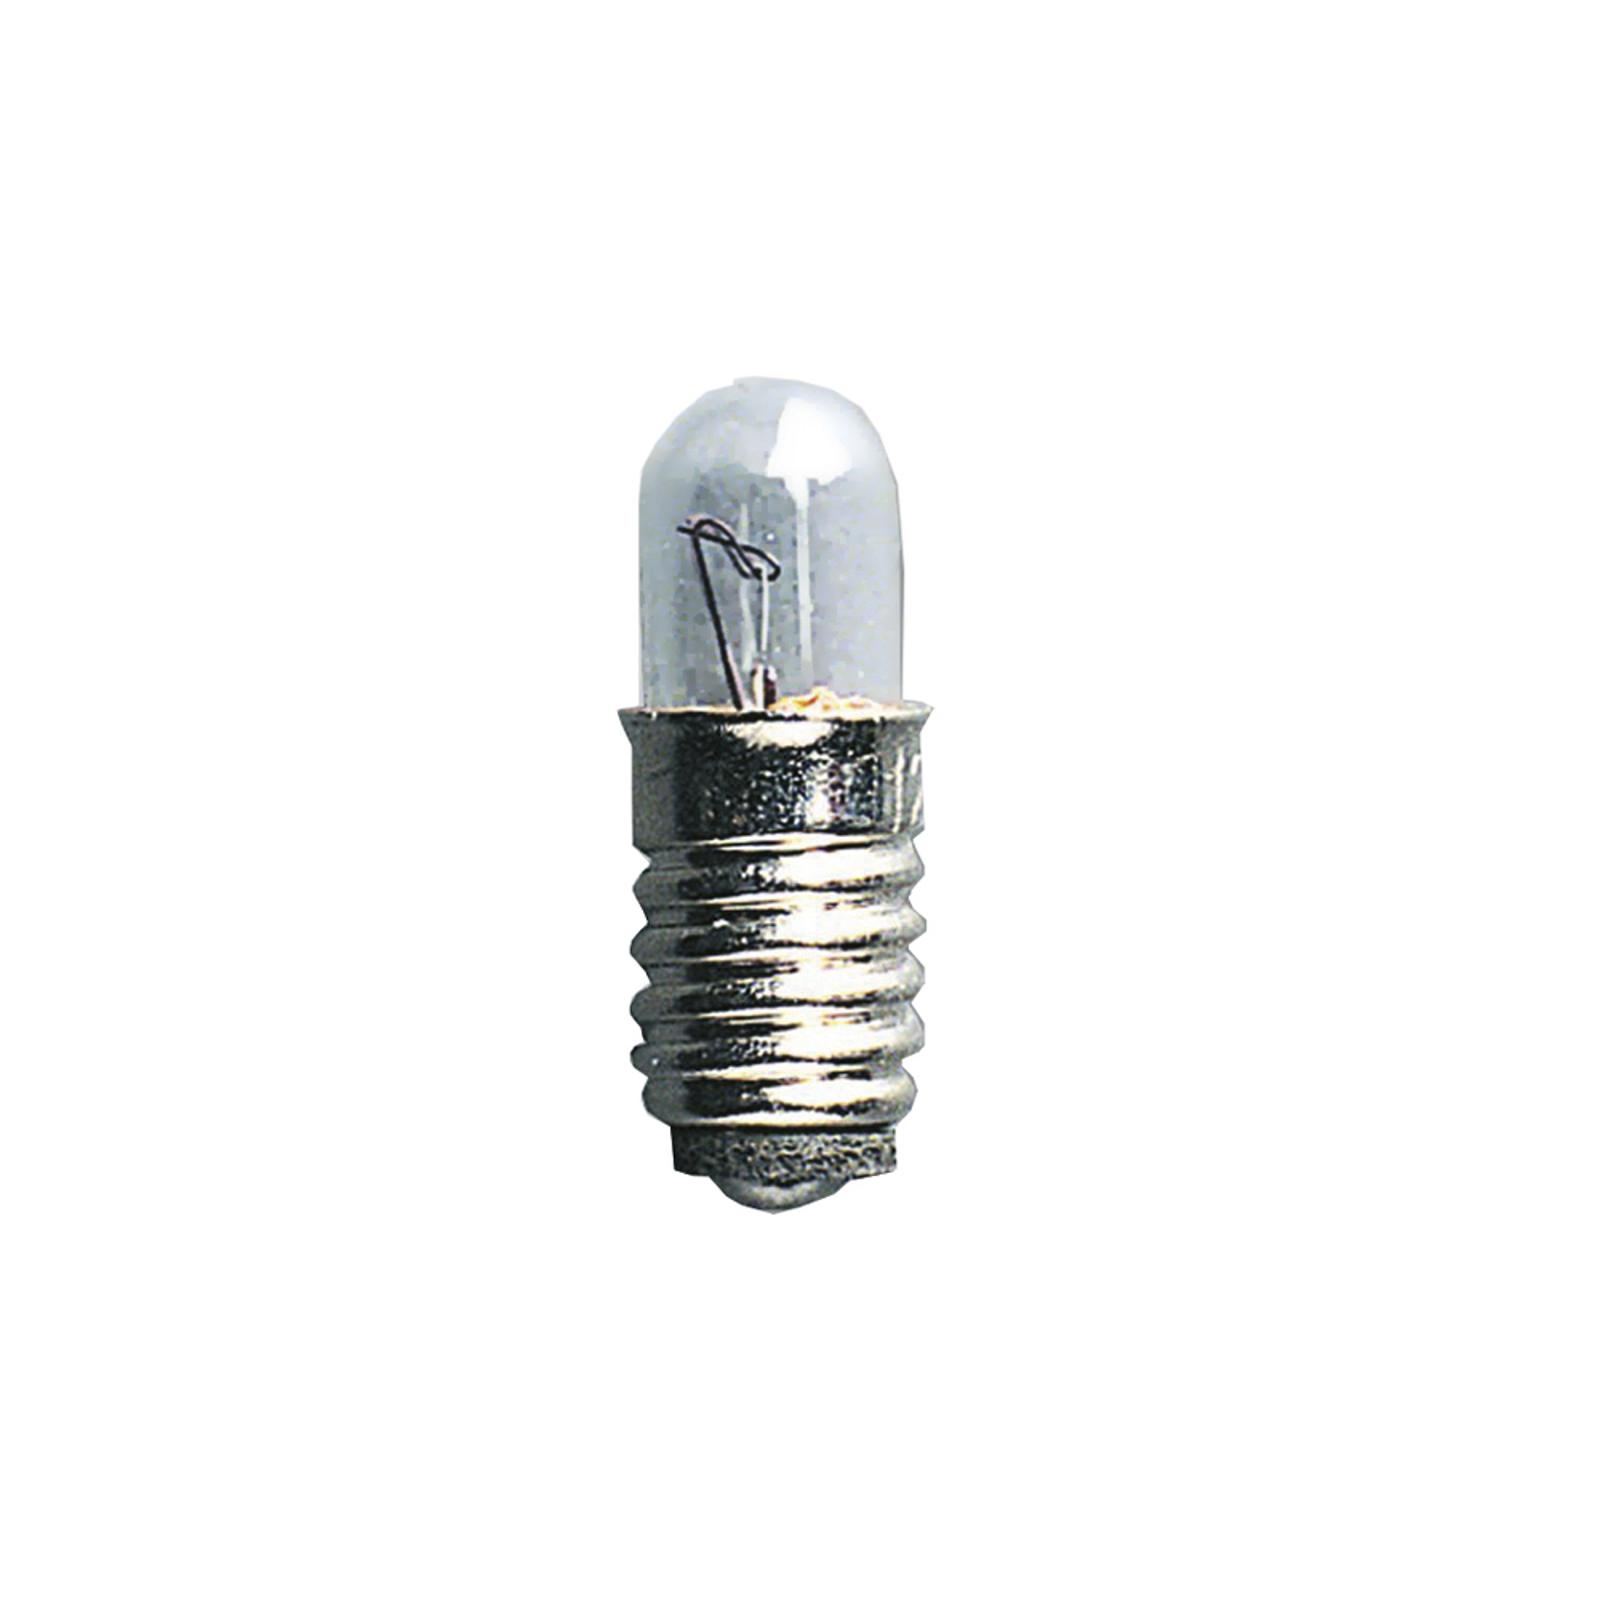 Náhradní žárovky E5 0,6W 12V NV, 5ks, čiré